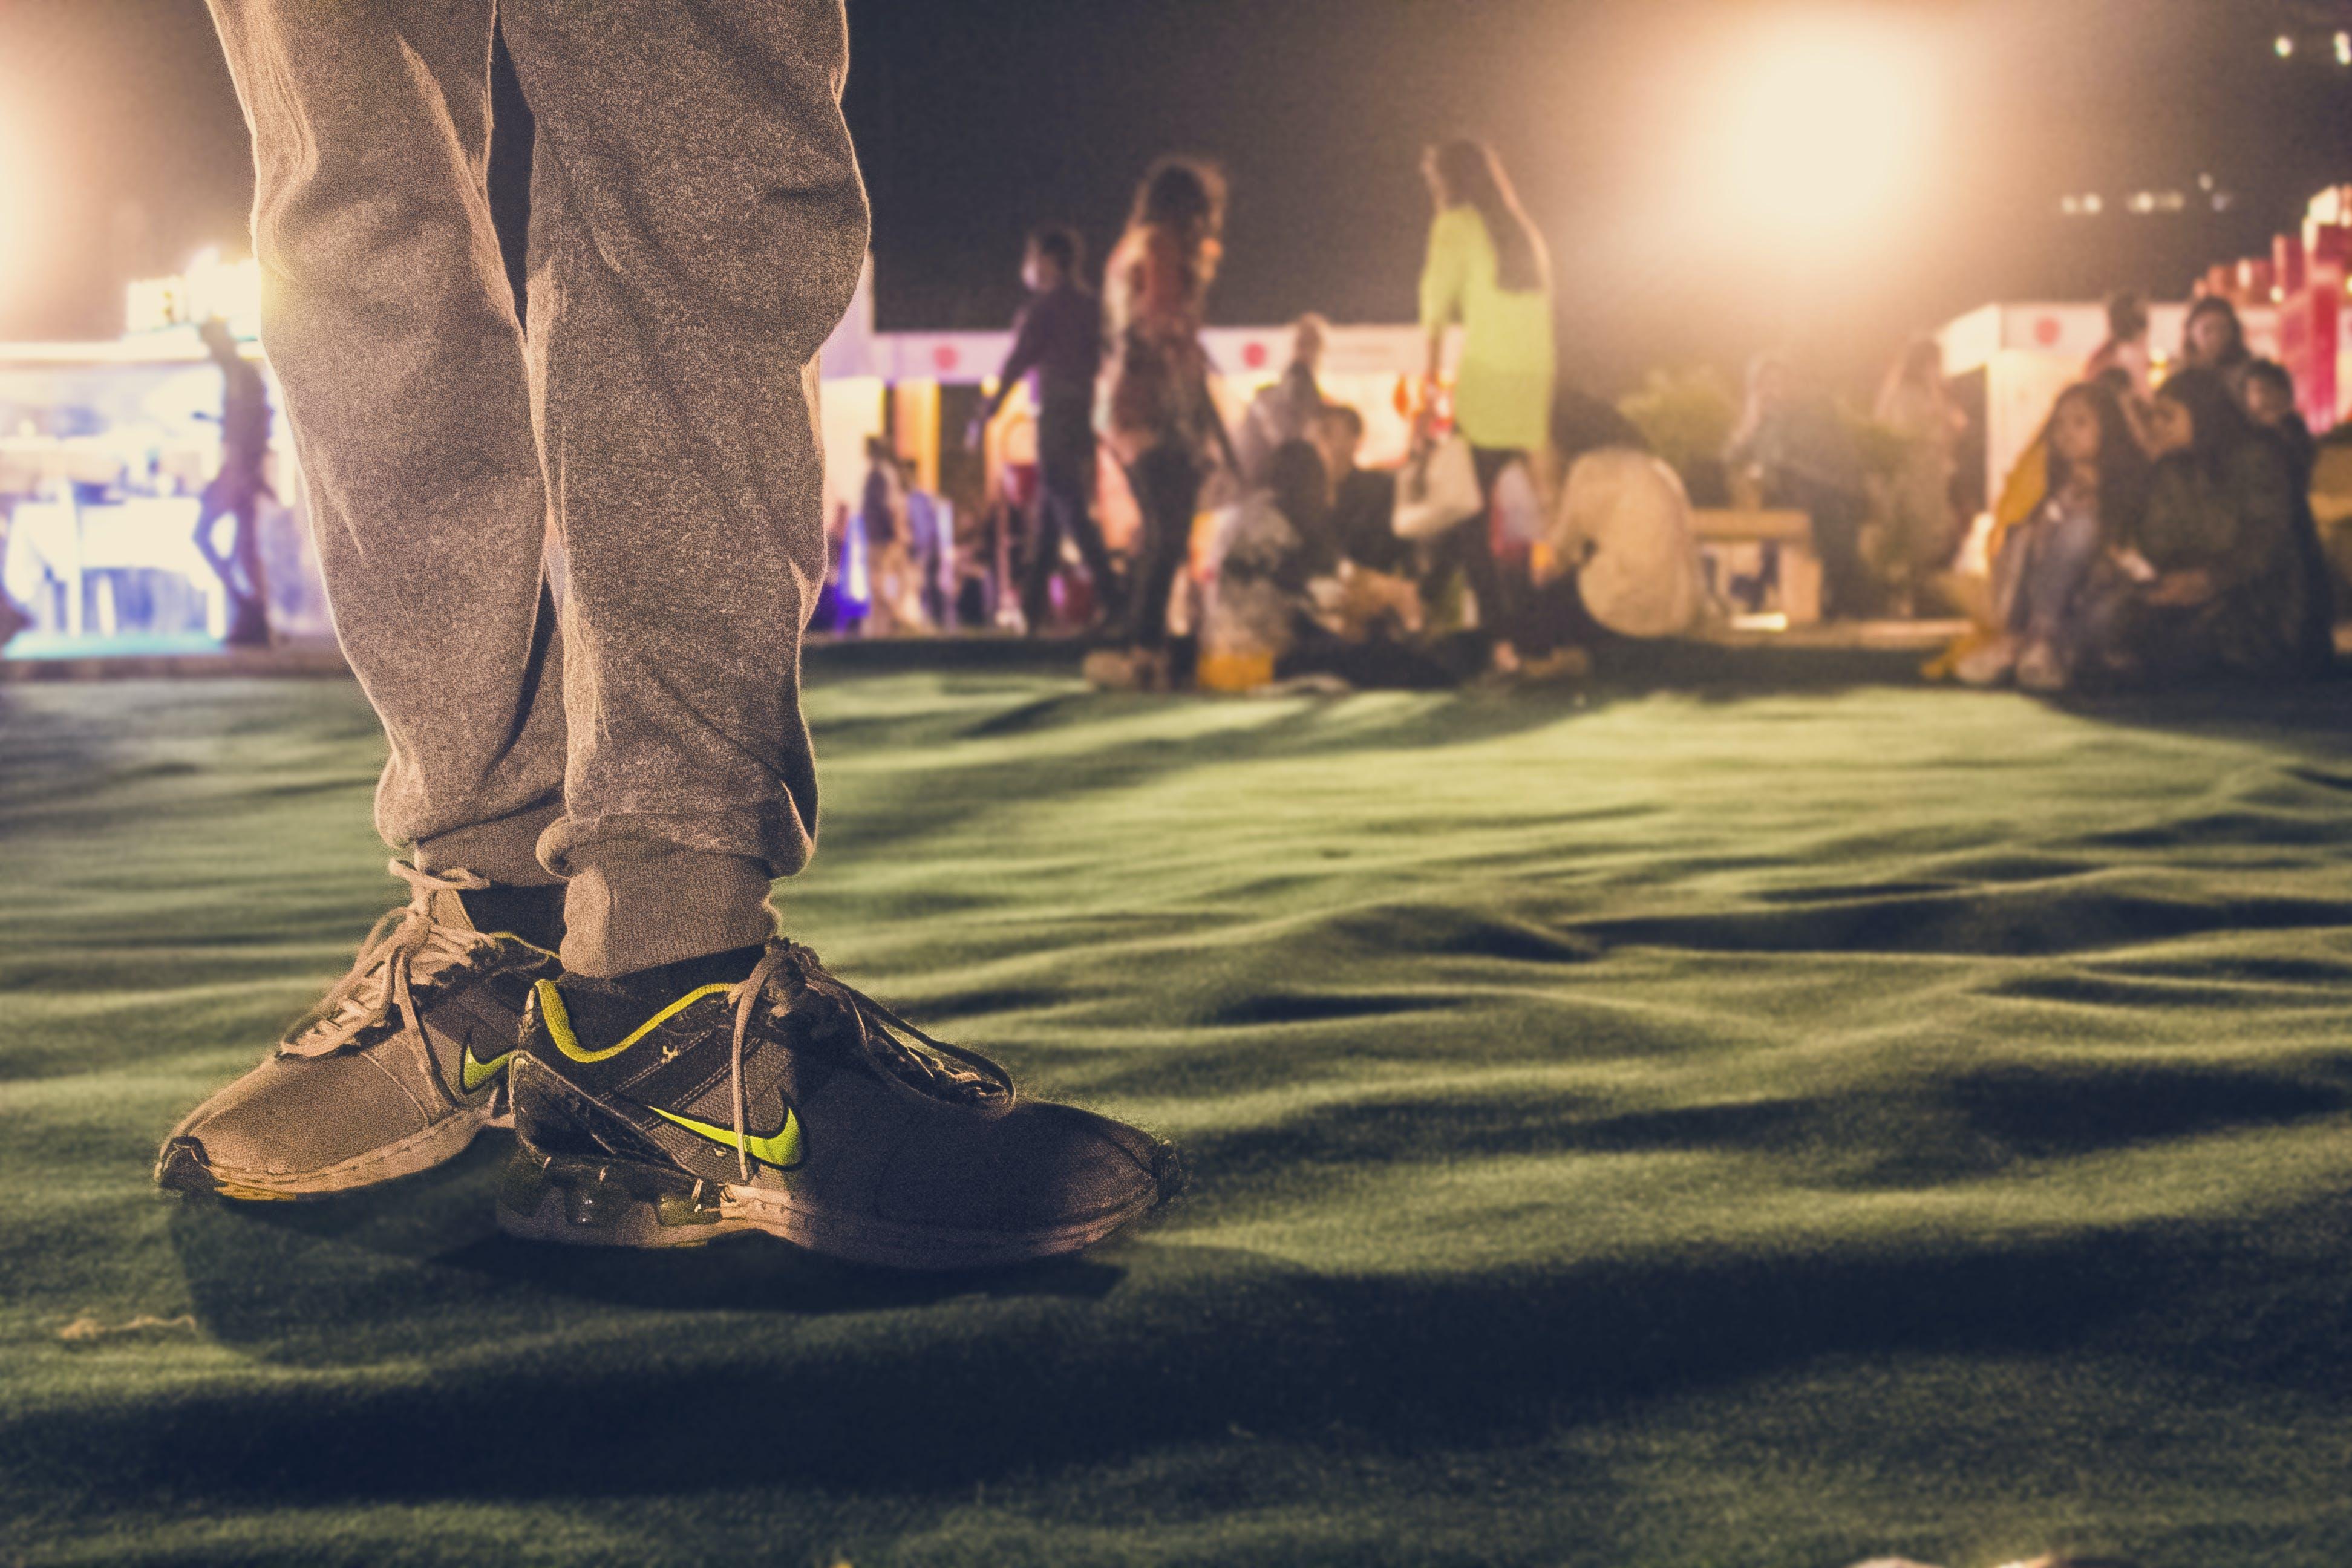 dybde, Festival, fodtøj